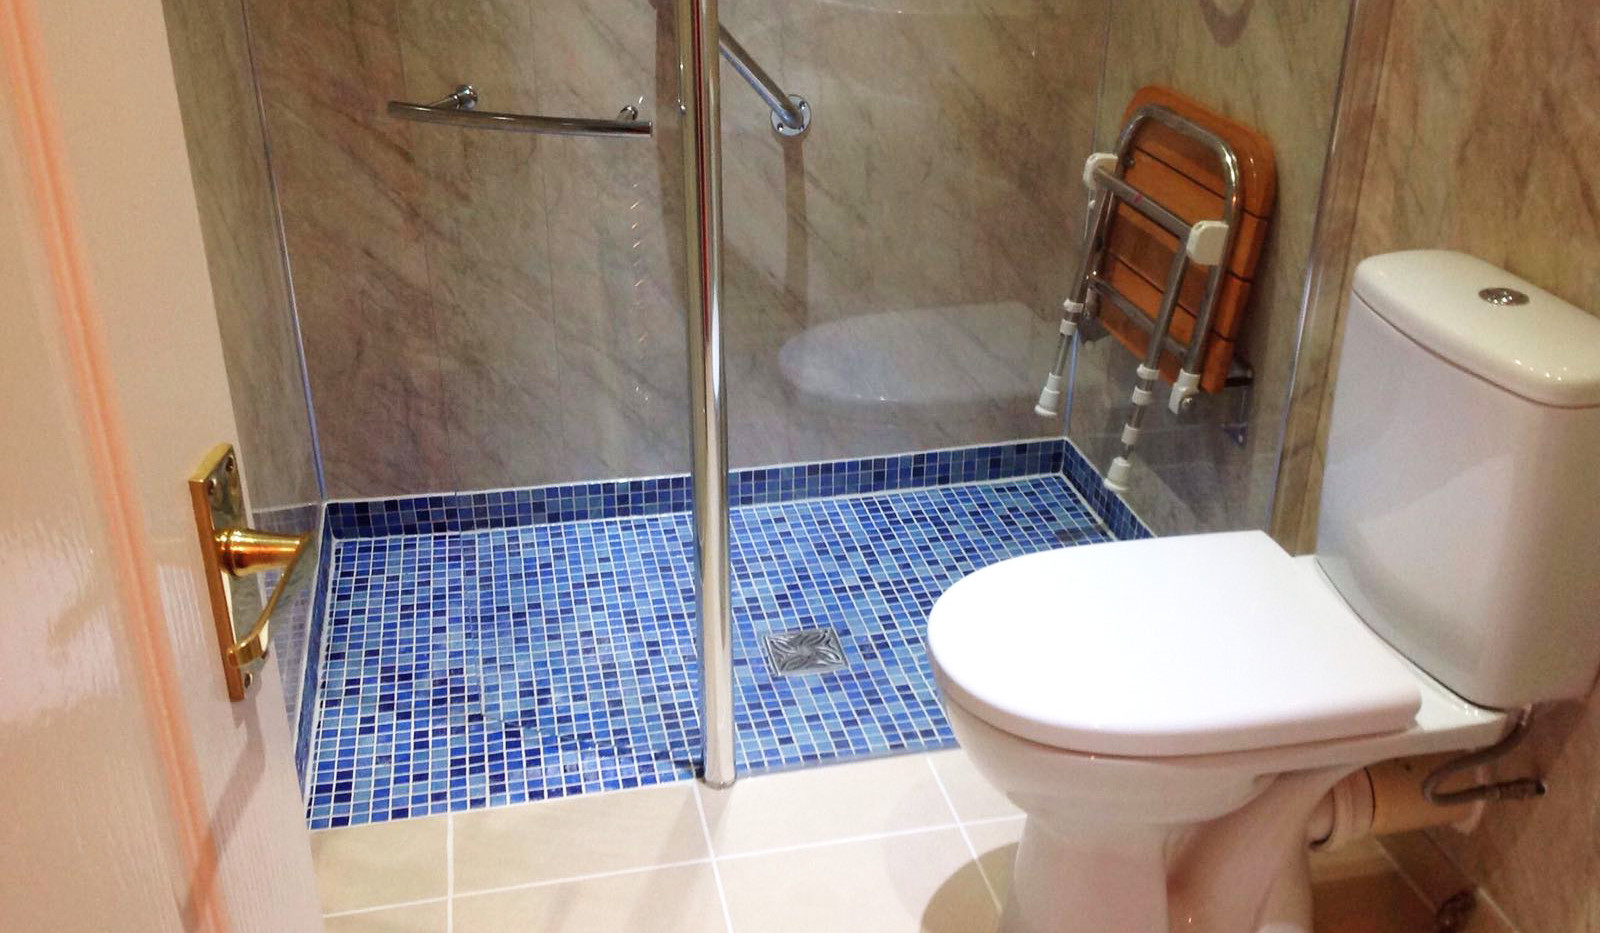 wetroom 1, Ability Bathing, Boston, Lincolnshire